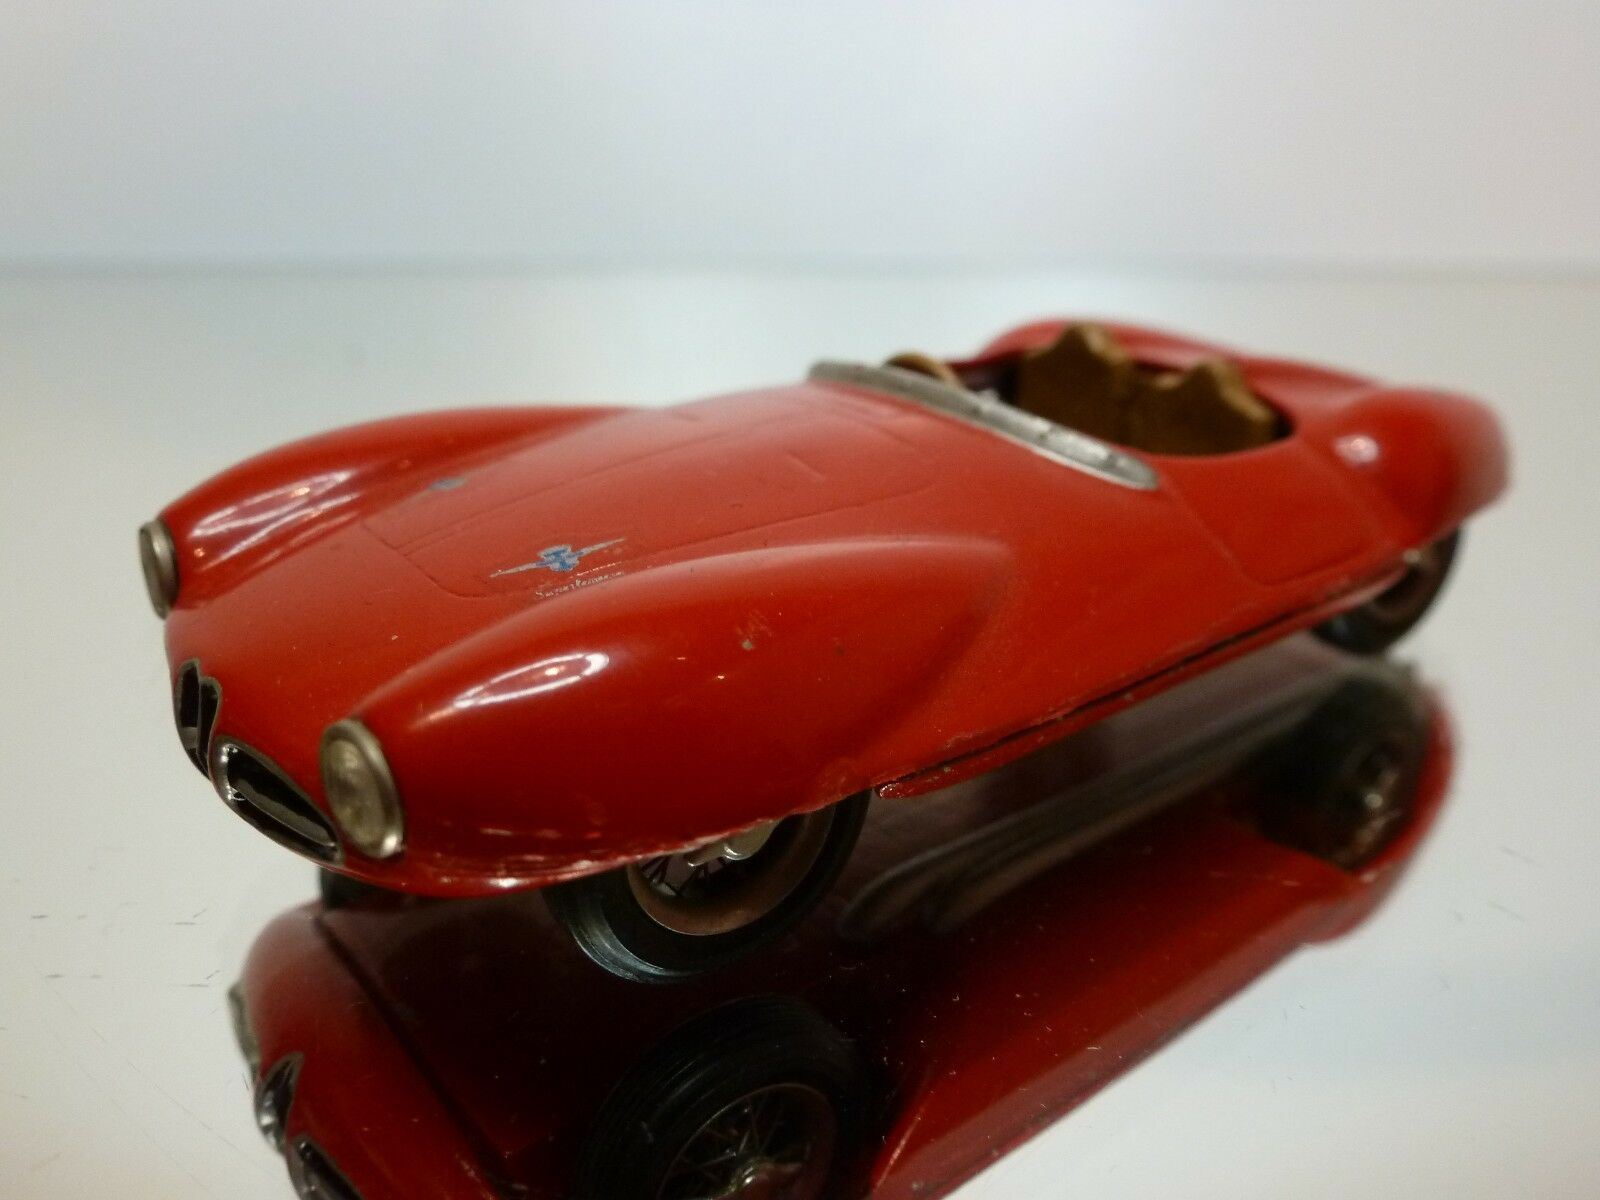 AUTOSTILE 4 KIT (built brianza) ALFA ROMEO 1900 C52 SPYDER DISCO VOLANTE - 1 43